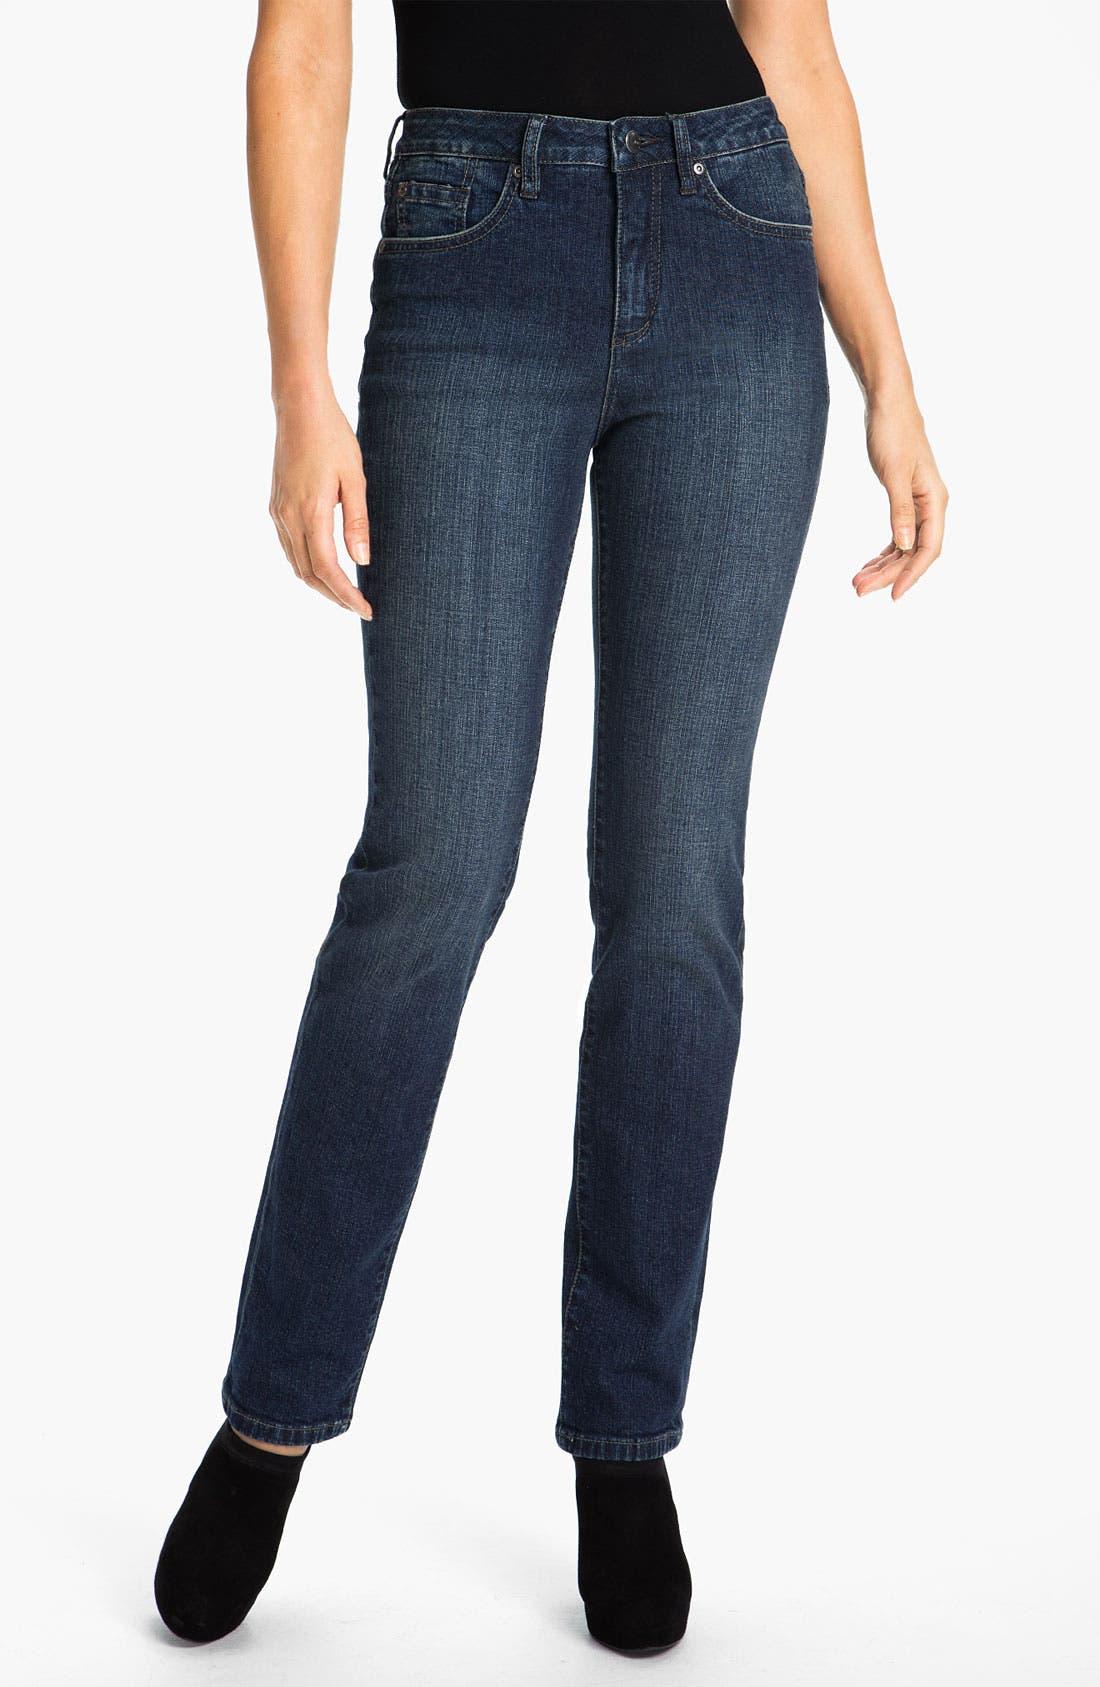 Main Image - Jag Jeans 'Sydney' Straight Leg Jeans (Billie Blue) (Petite)